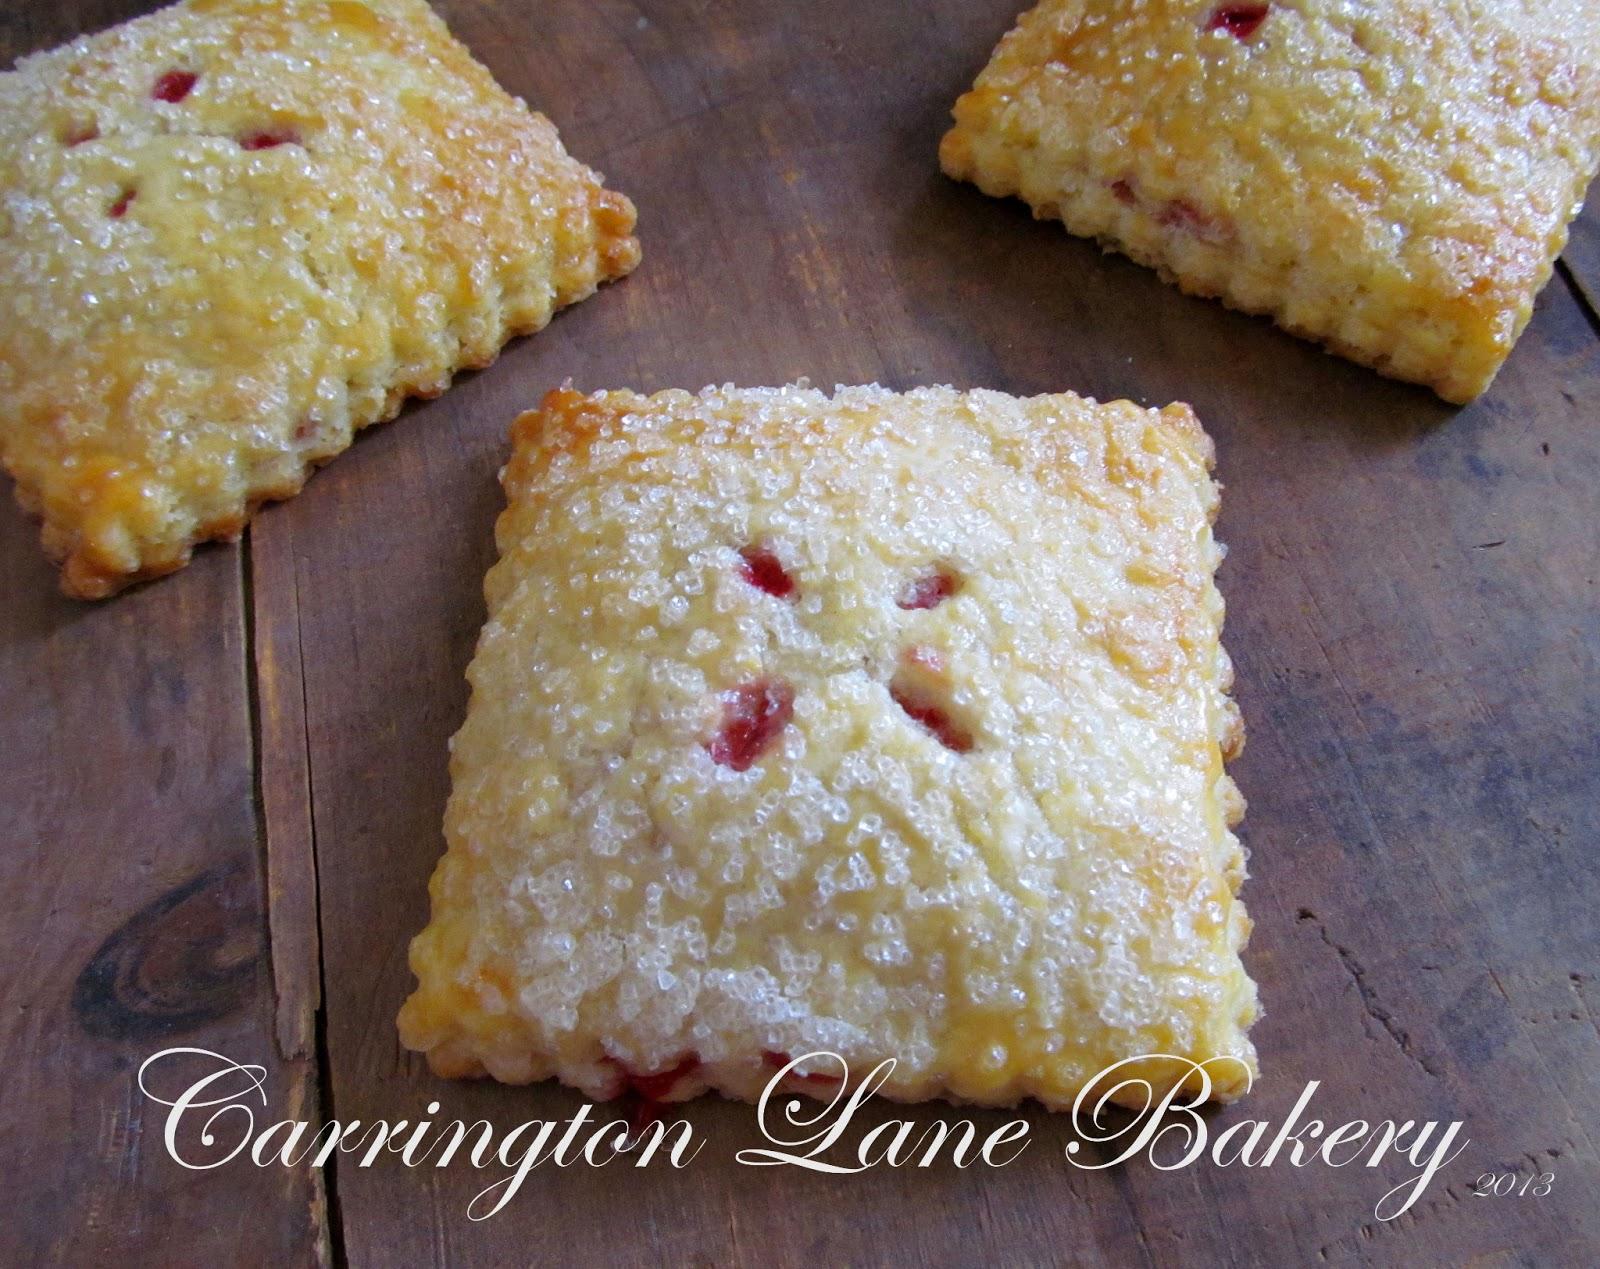 Carrington Lane Bakery: Strawberry Cream Cheese Hand Pies